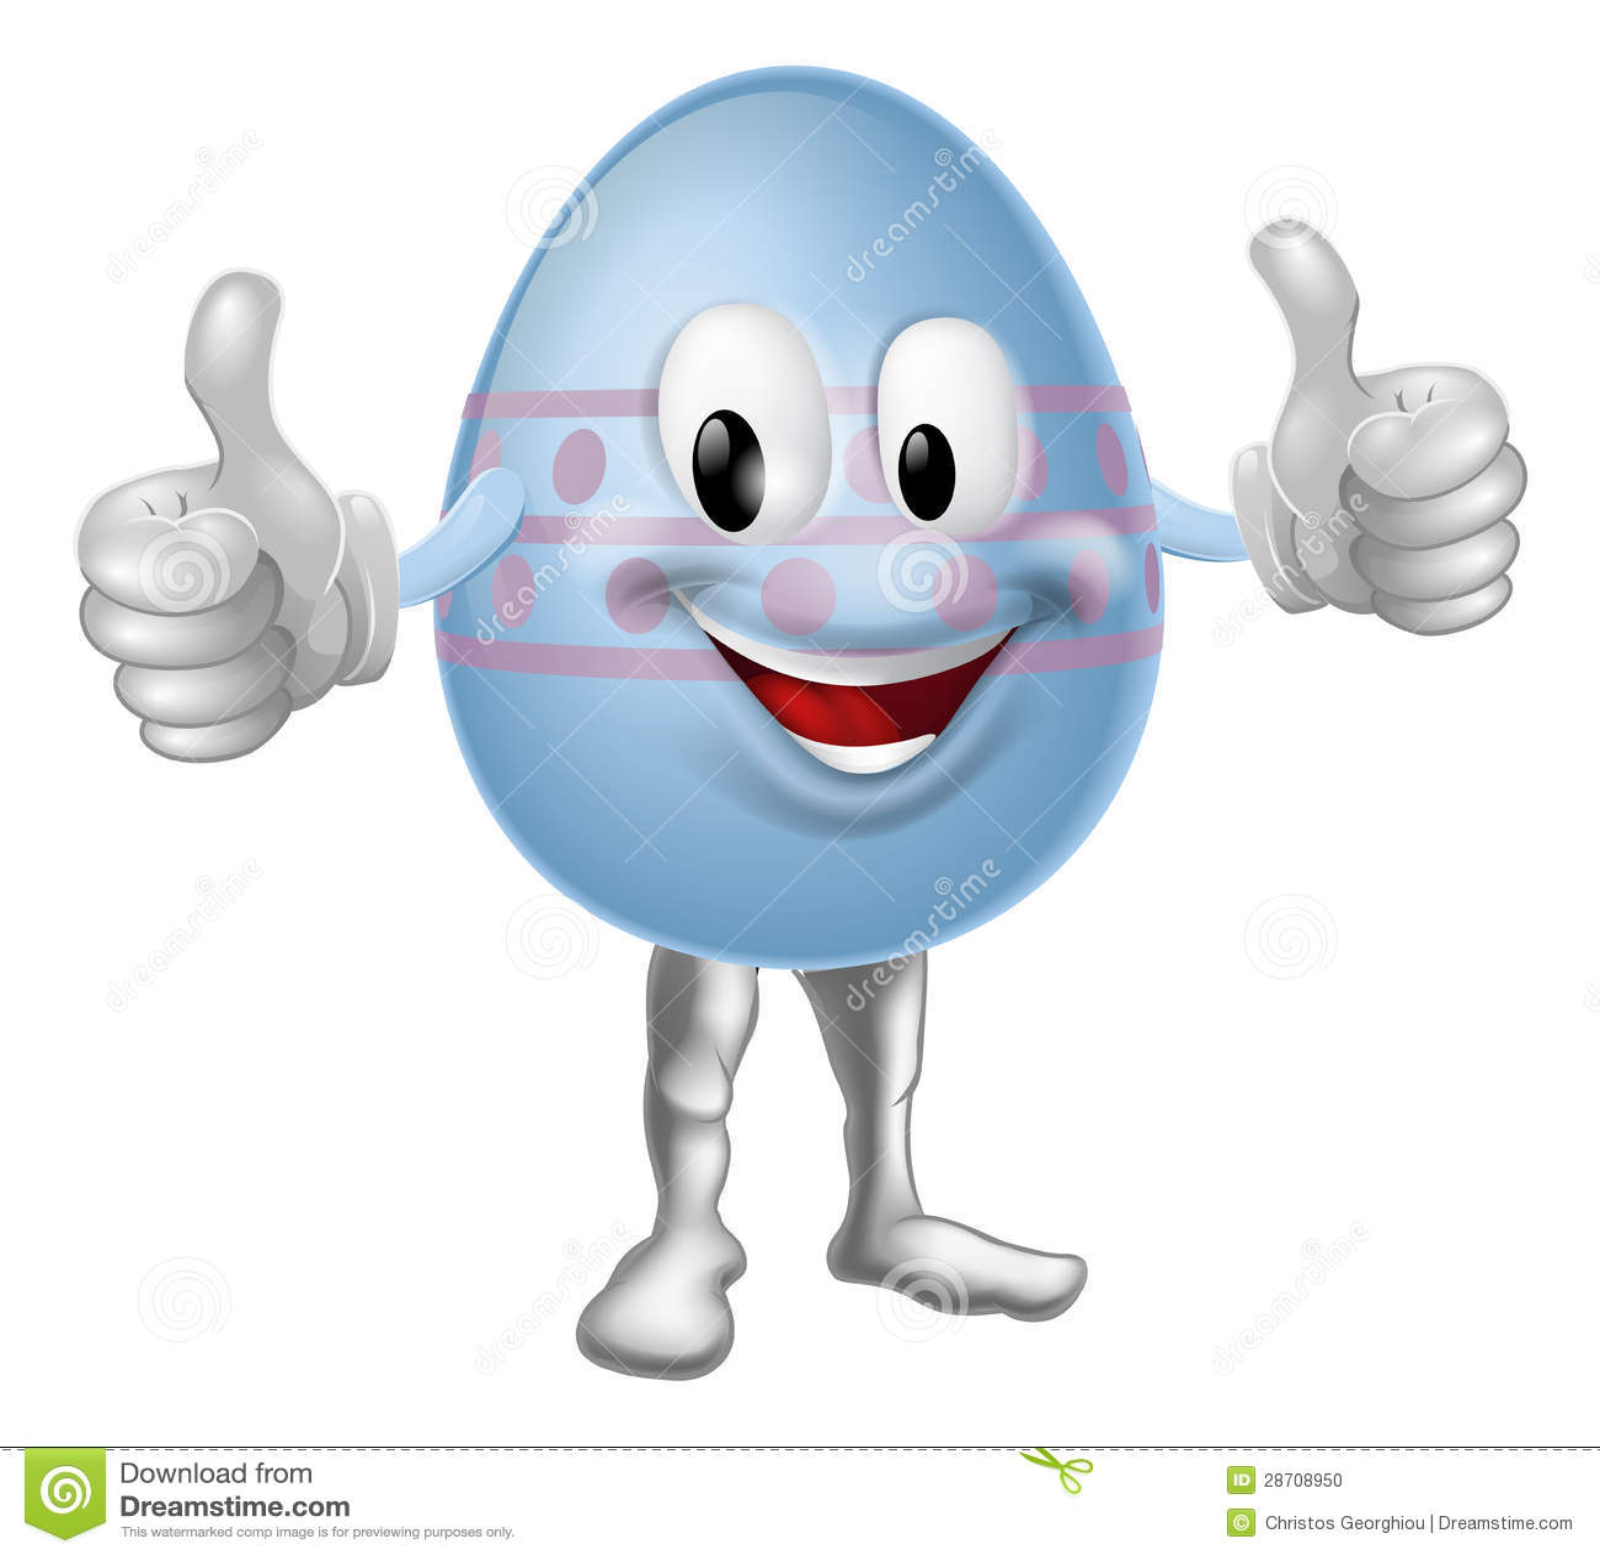 Cartoon chocolate easter egg character vector illustration